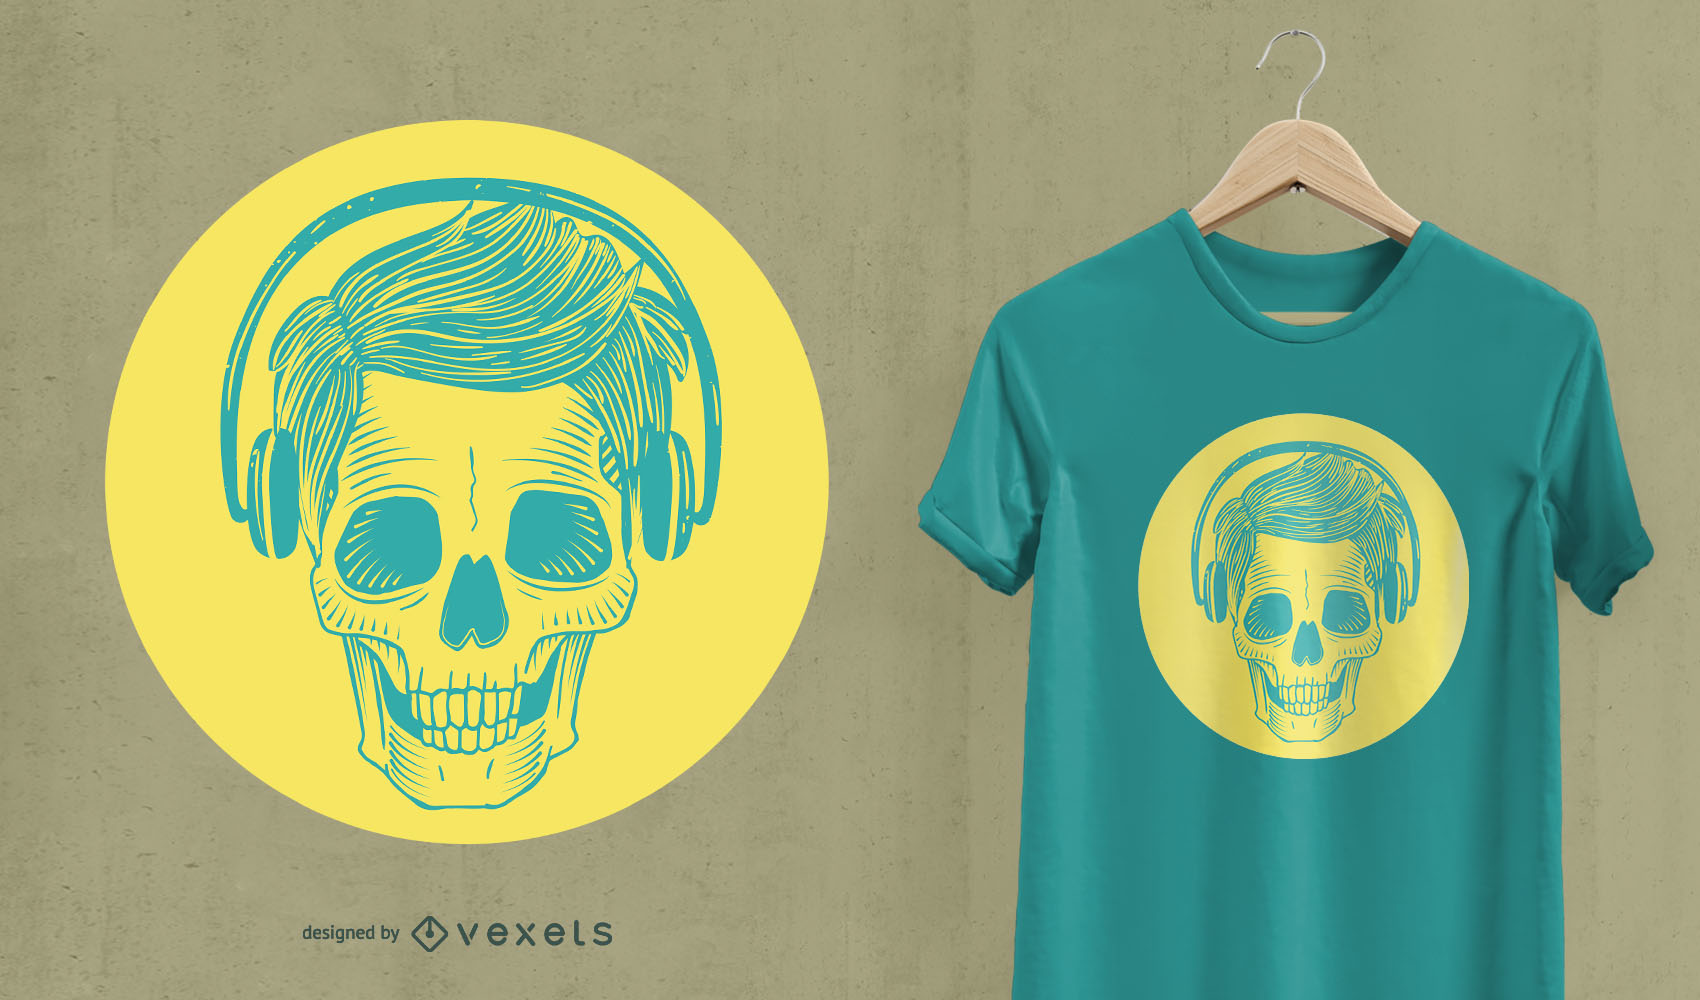 Skull with headphones t-shirt design